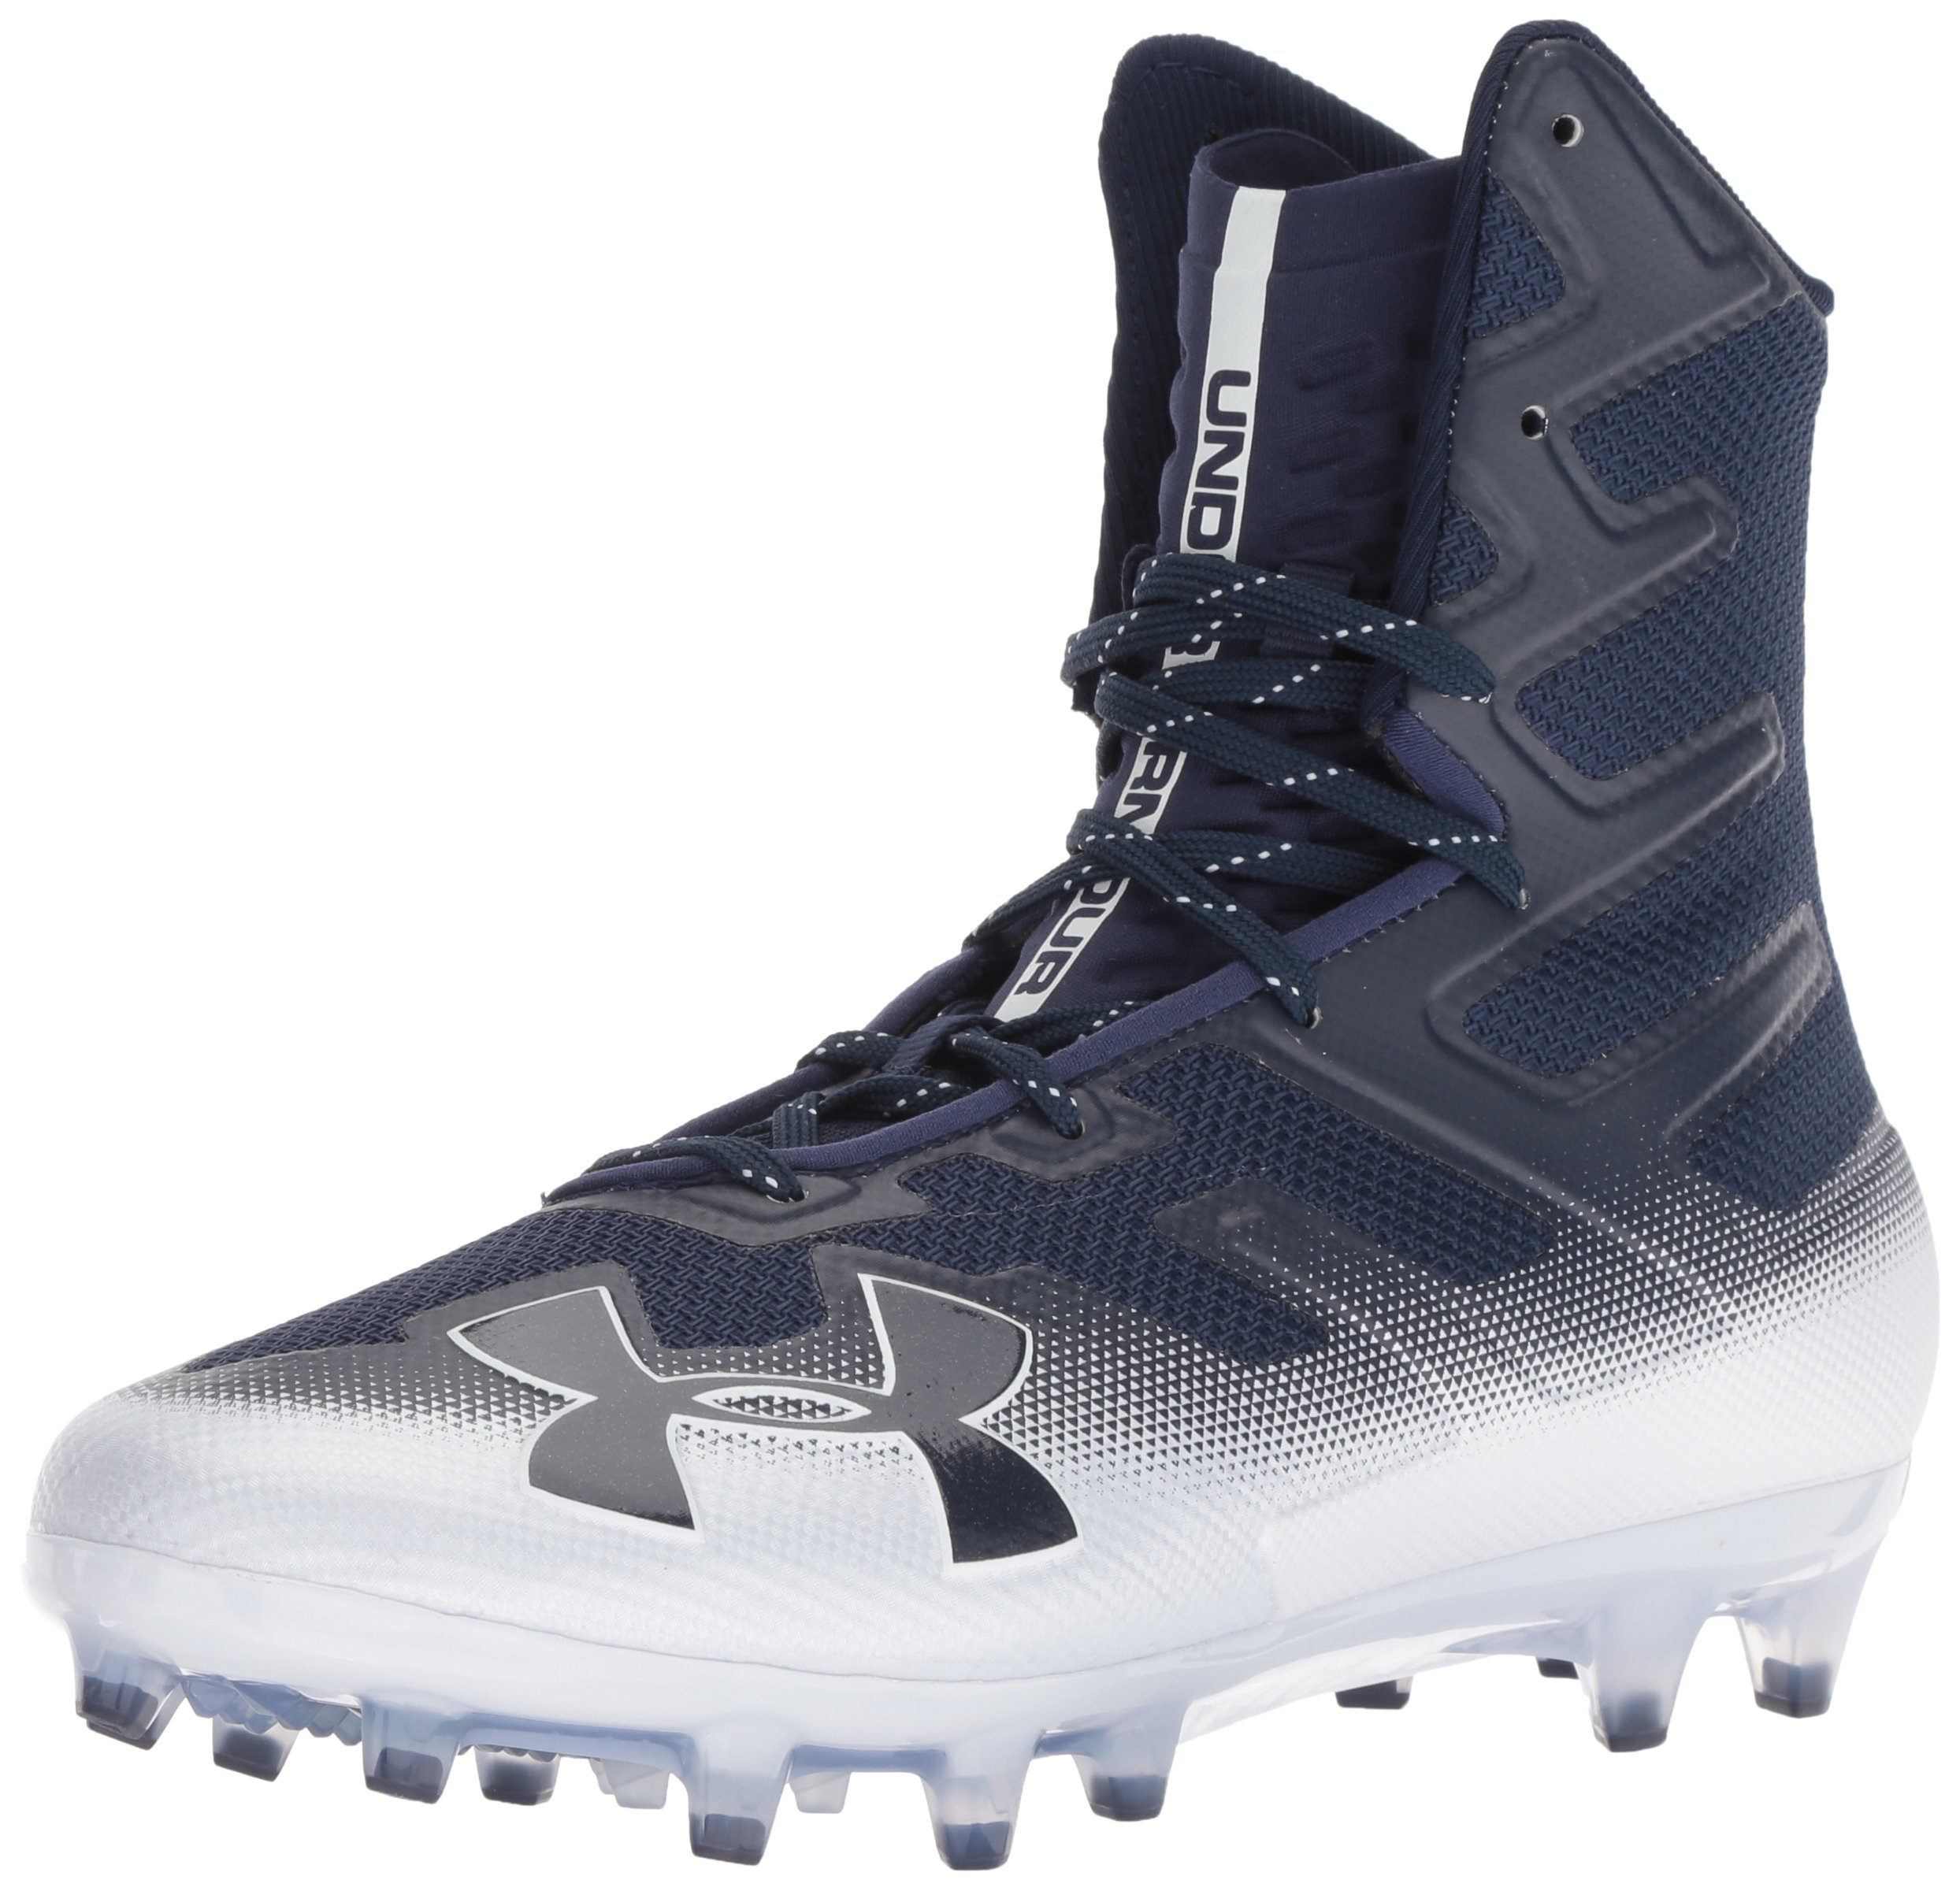 Under Armour Men's Highlight MC Football Shoe Midnight Navy (402)/White 6.5